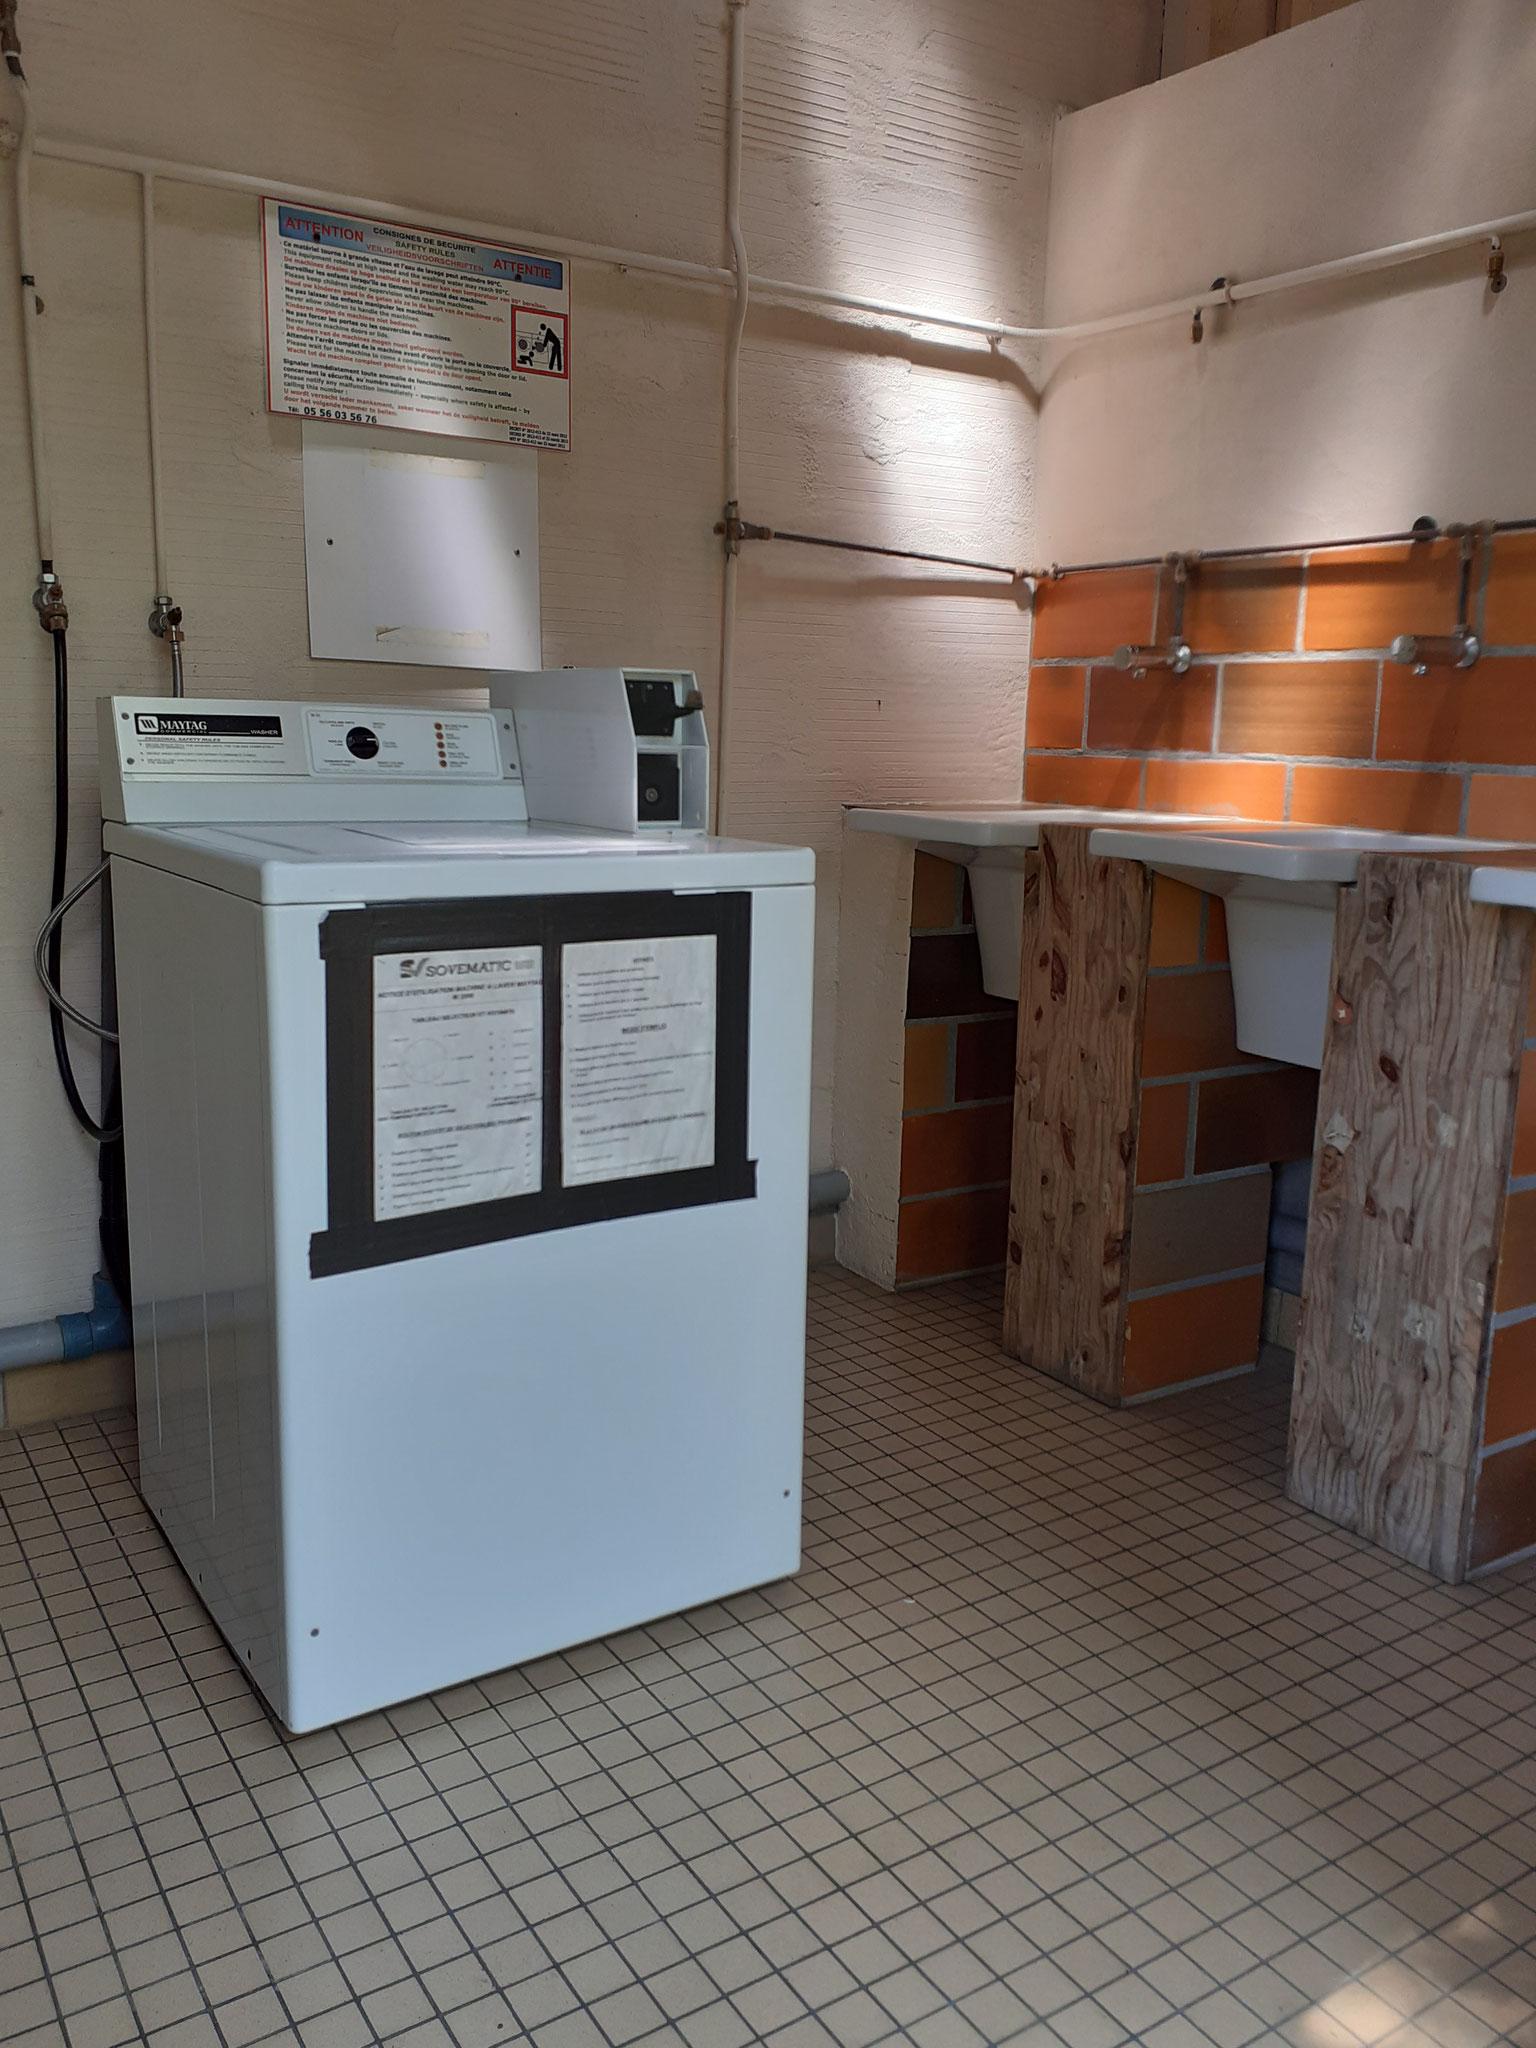 Laundry room with washing machine and wash basins